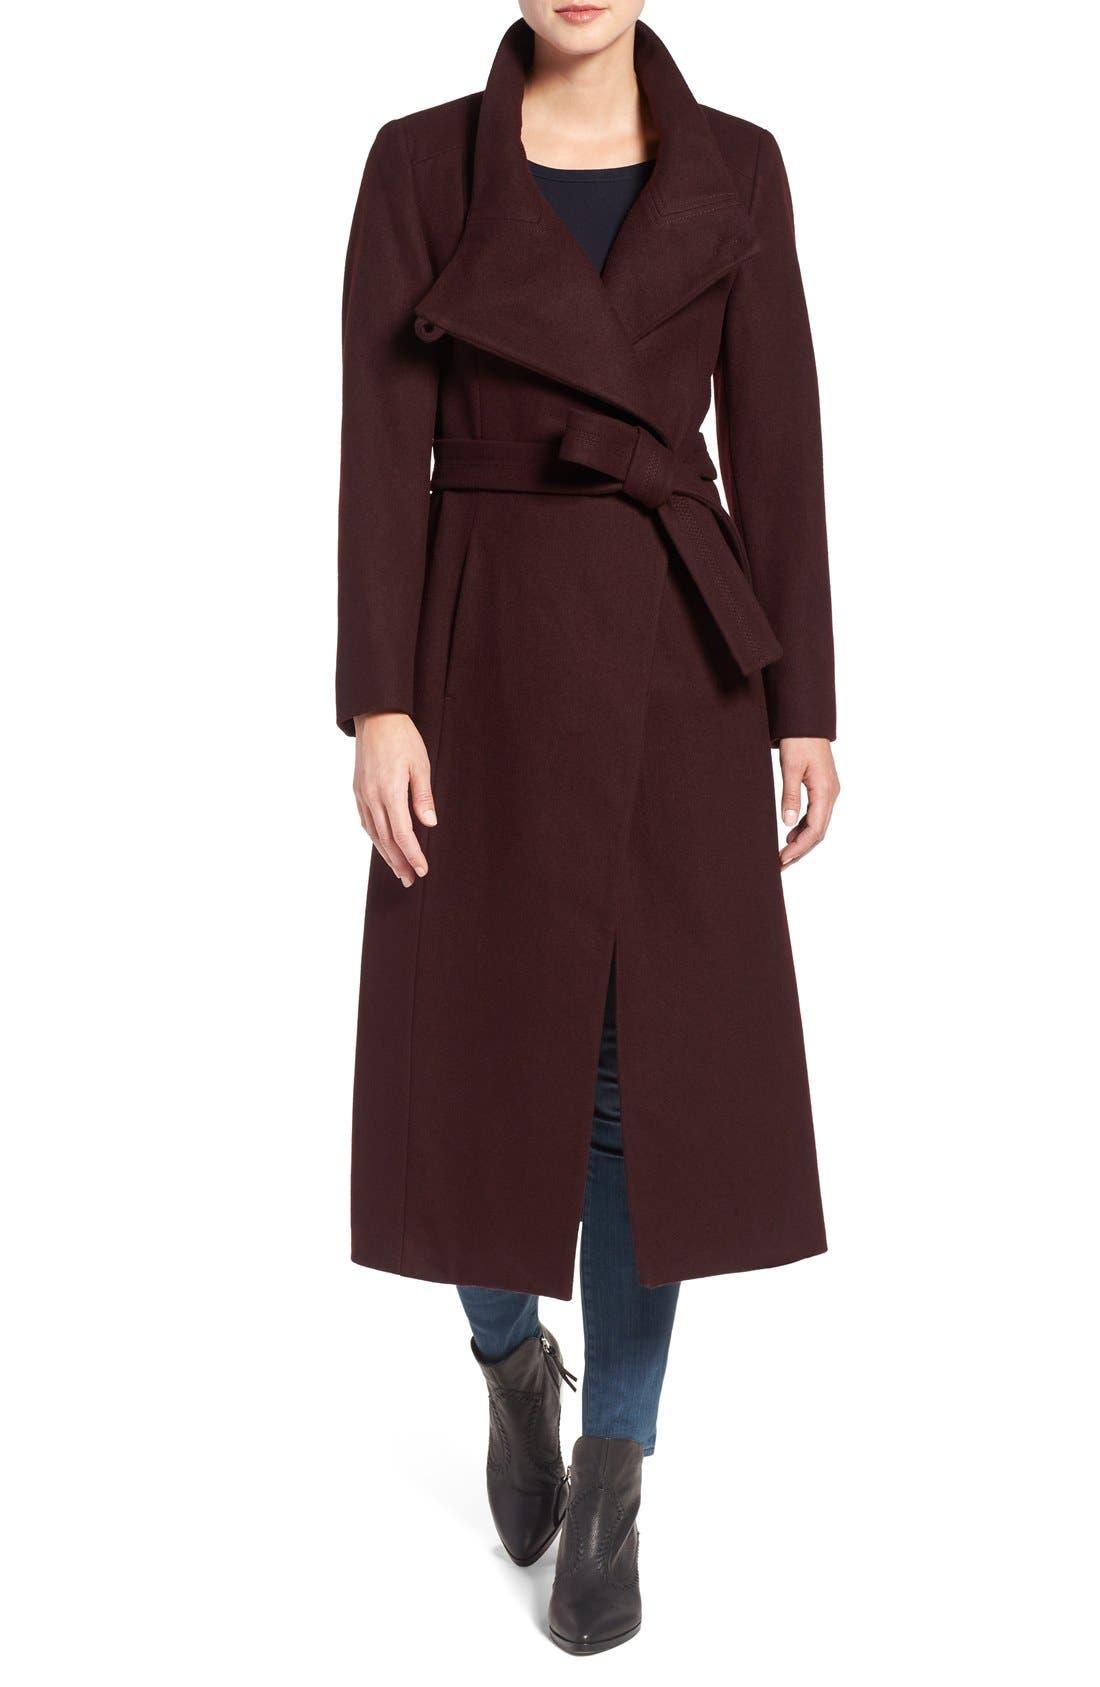 Black friday deals on ladies coats